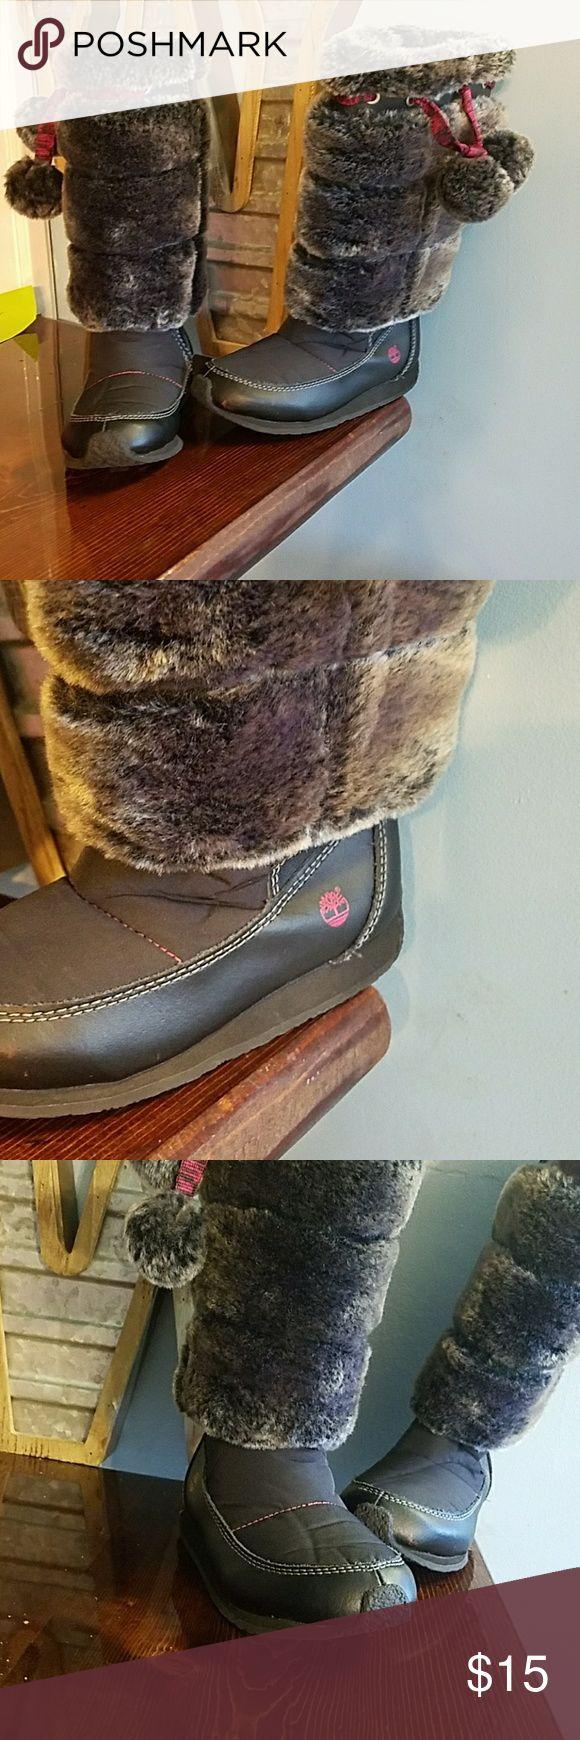 Timberland girls winter boots size 11 Super cute furry timberland boots for girls size 11 Timberland Shoes Boots